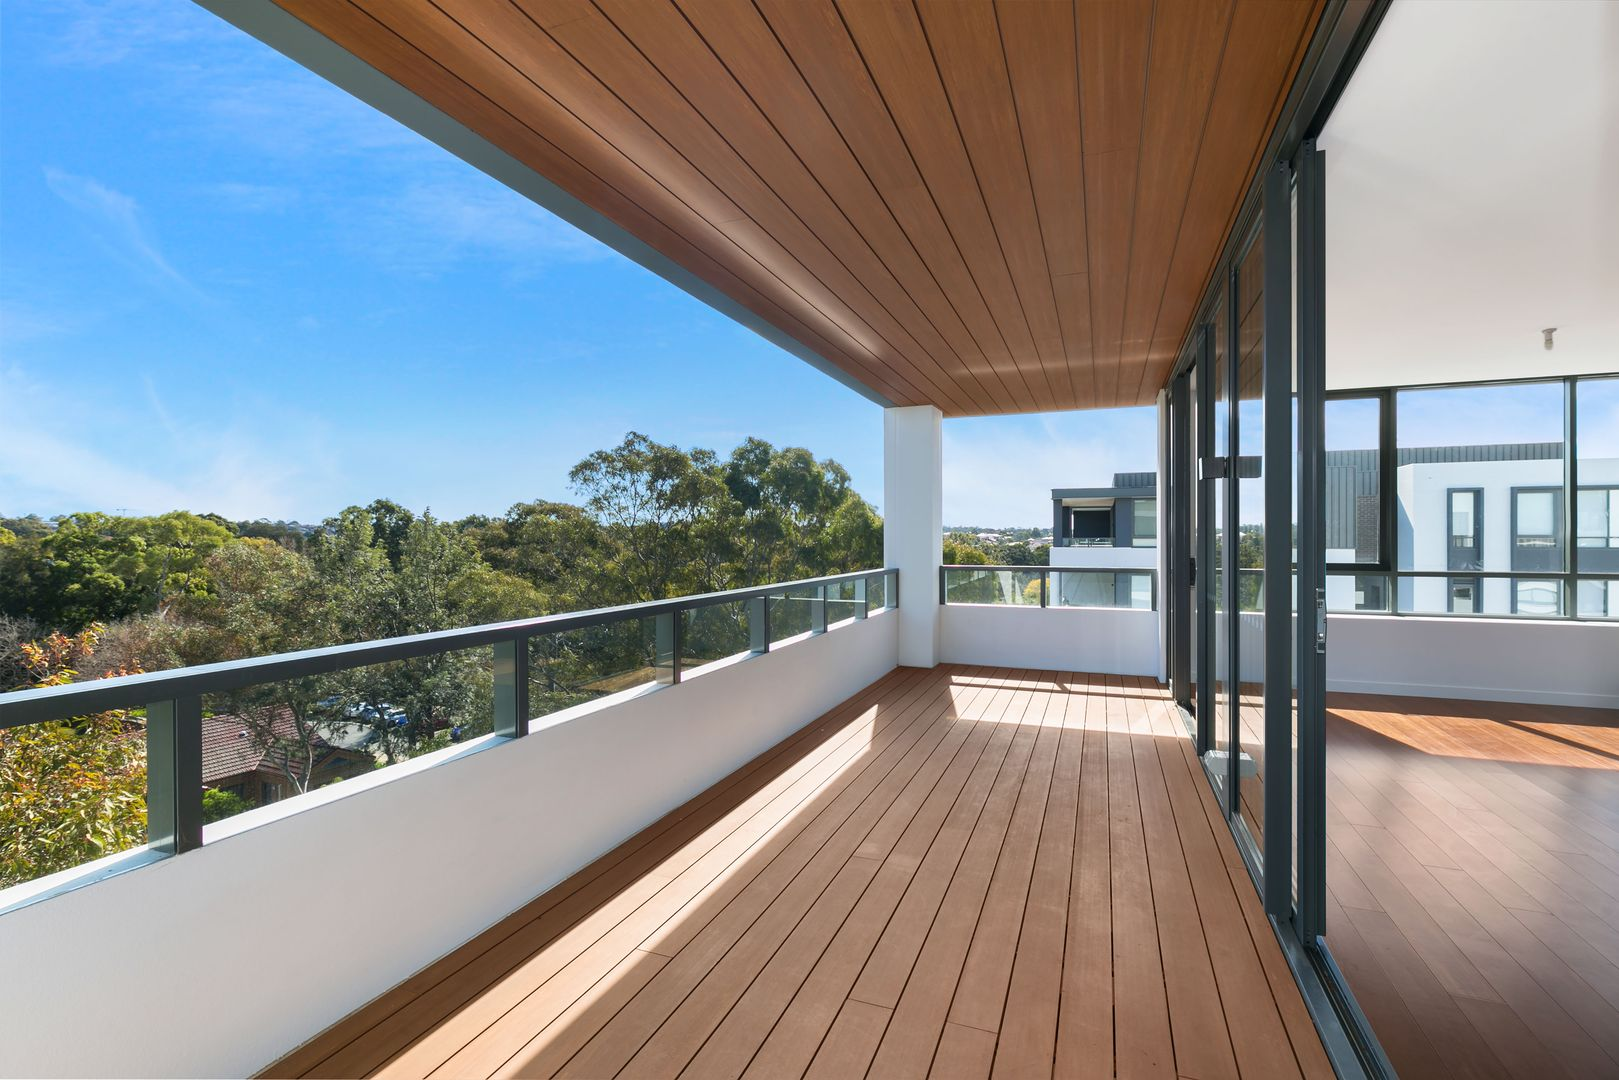 E604/3 Lardelli Drive, Ryde NSW 2112, Image 0